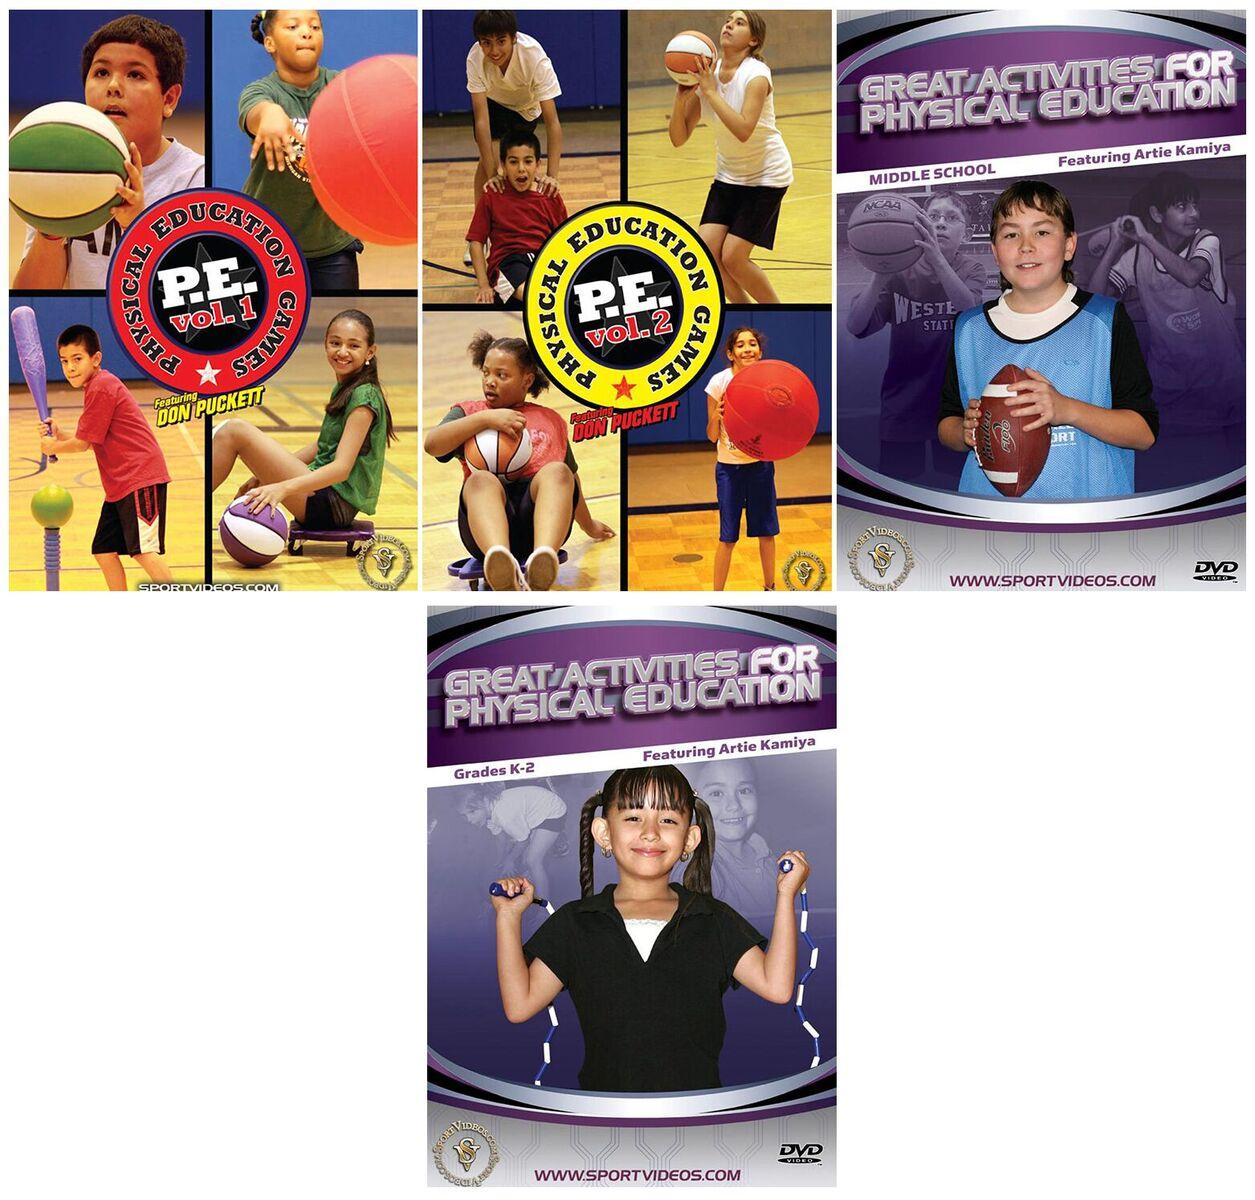 Physical Education 4 DVD Set